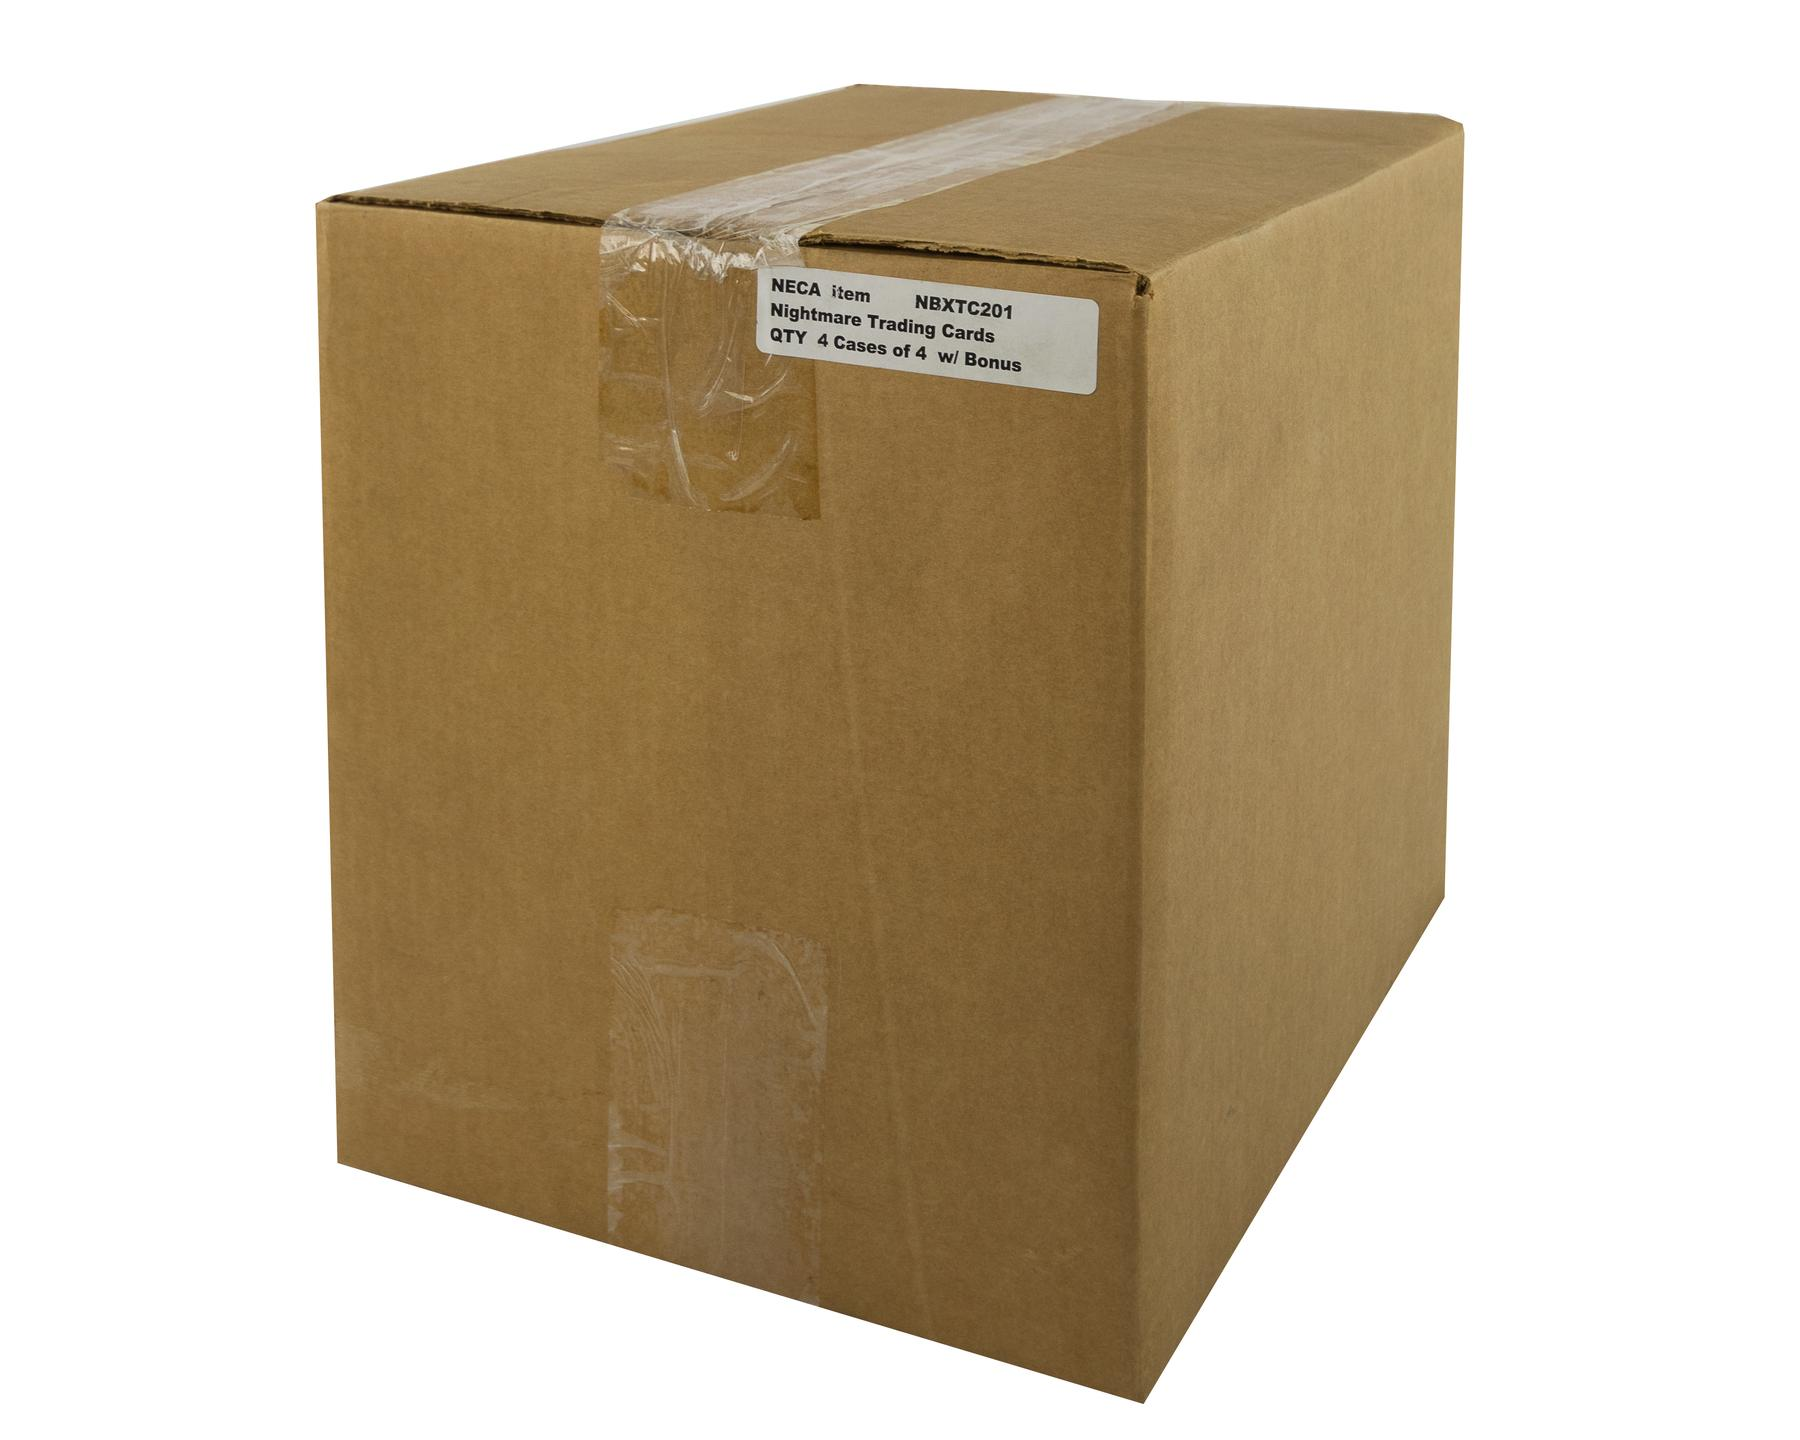 NIGHTMARE BEFORE CHRISTMAS 16 BOX CASE - 36 PACK BOX - TIM BURTON ...